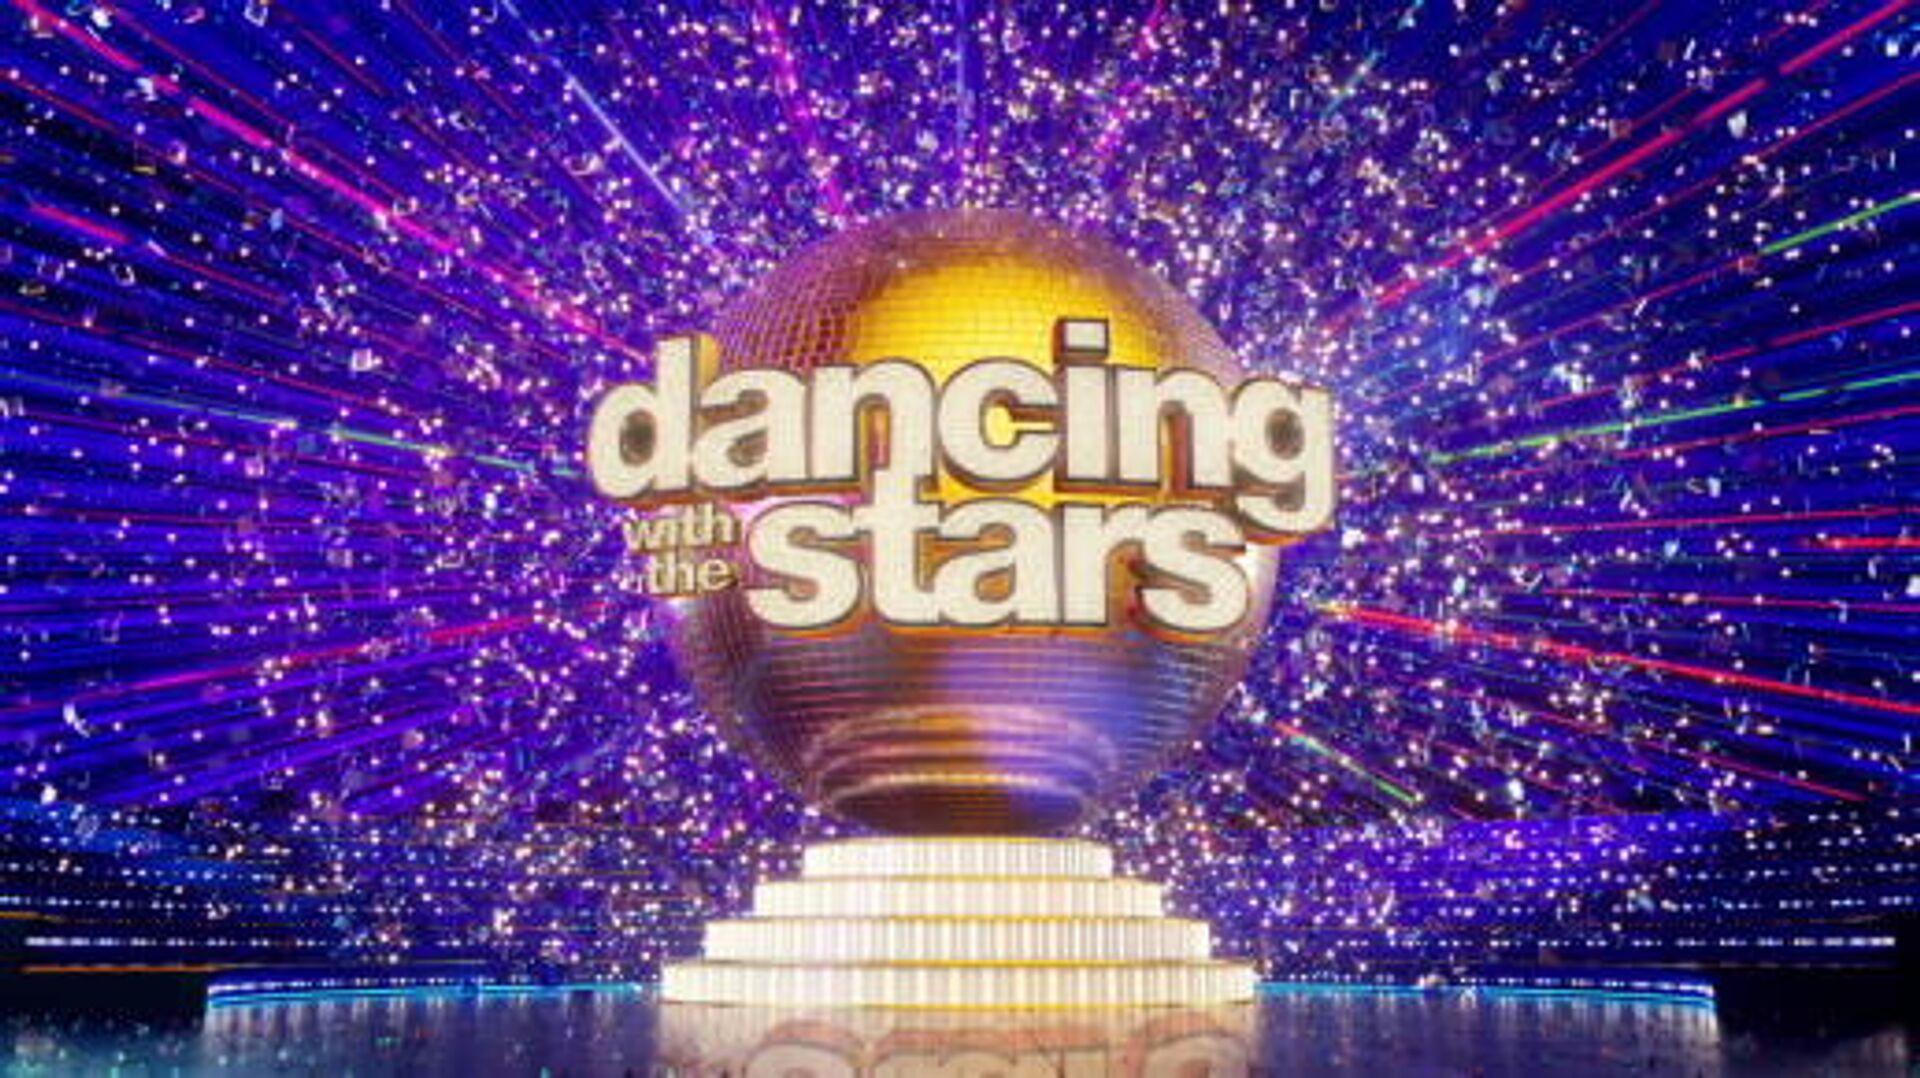 Dancing with the Stars - Sputnik Ελλάδα, 1920, 21.09.2021